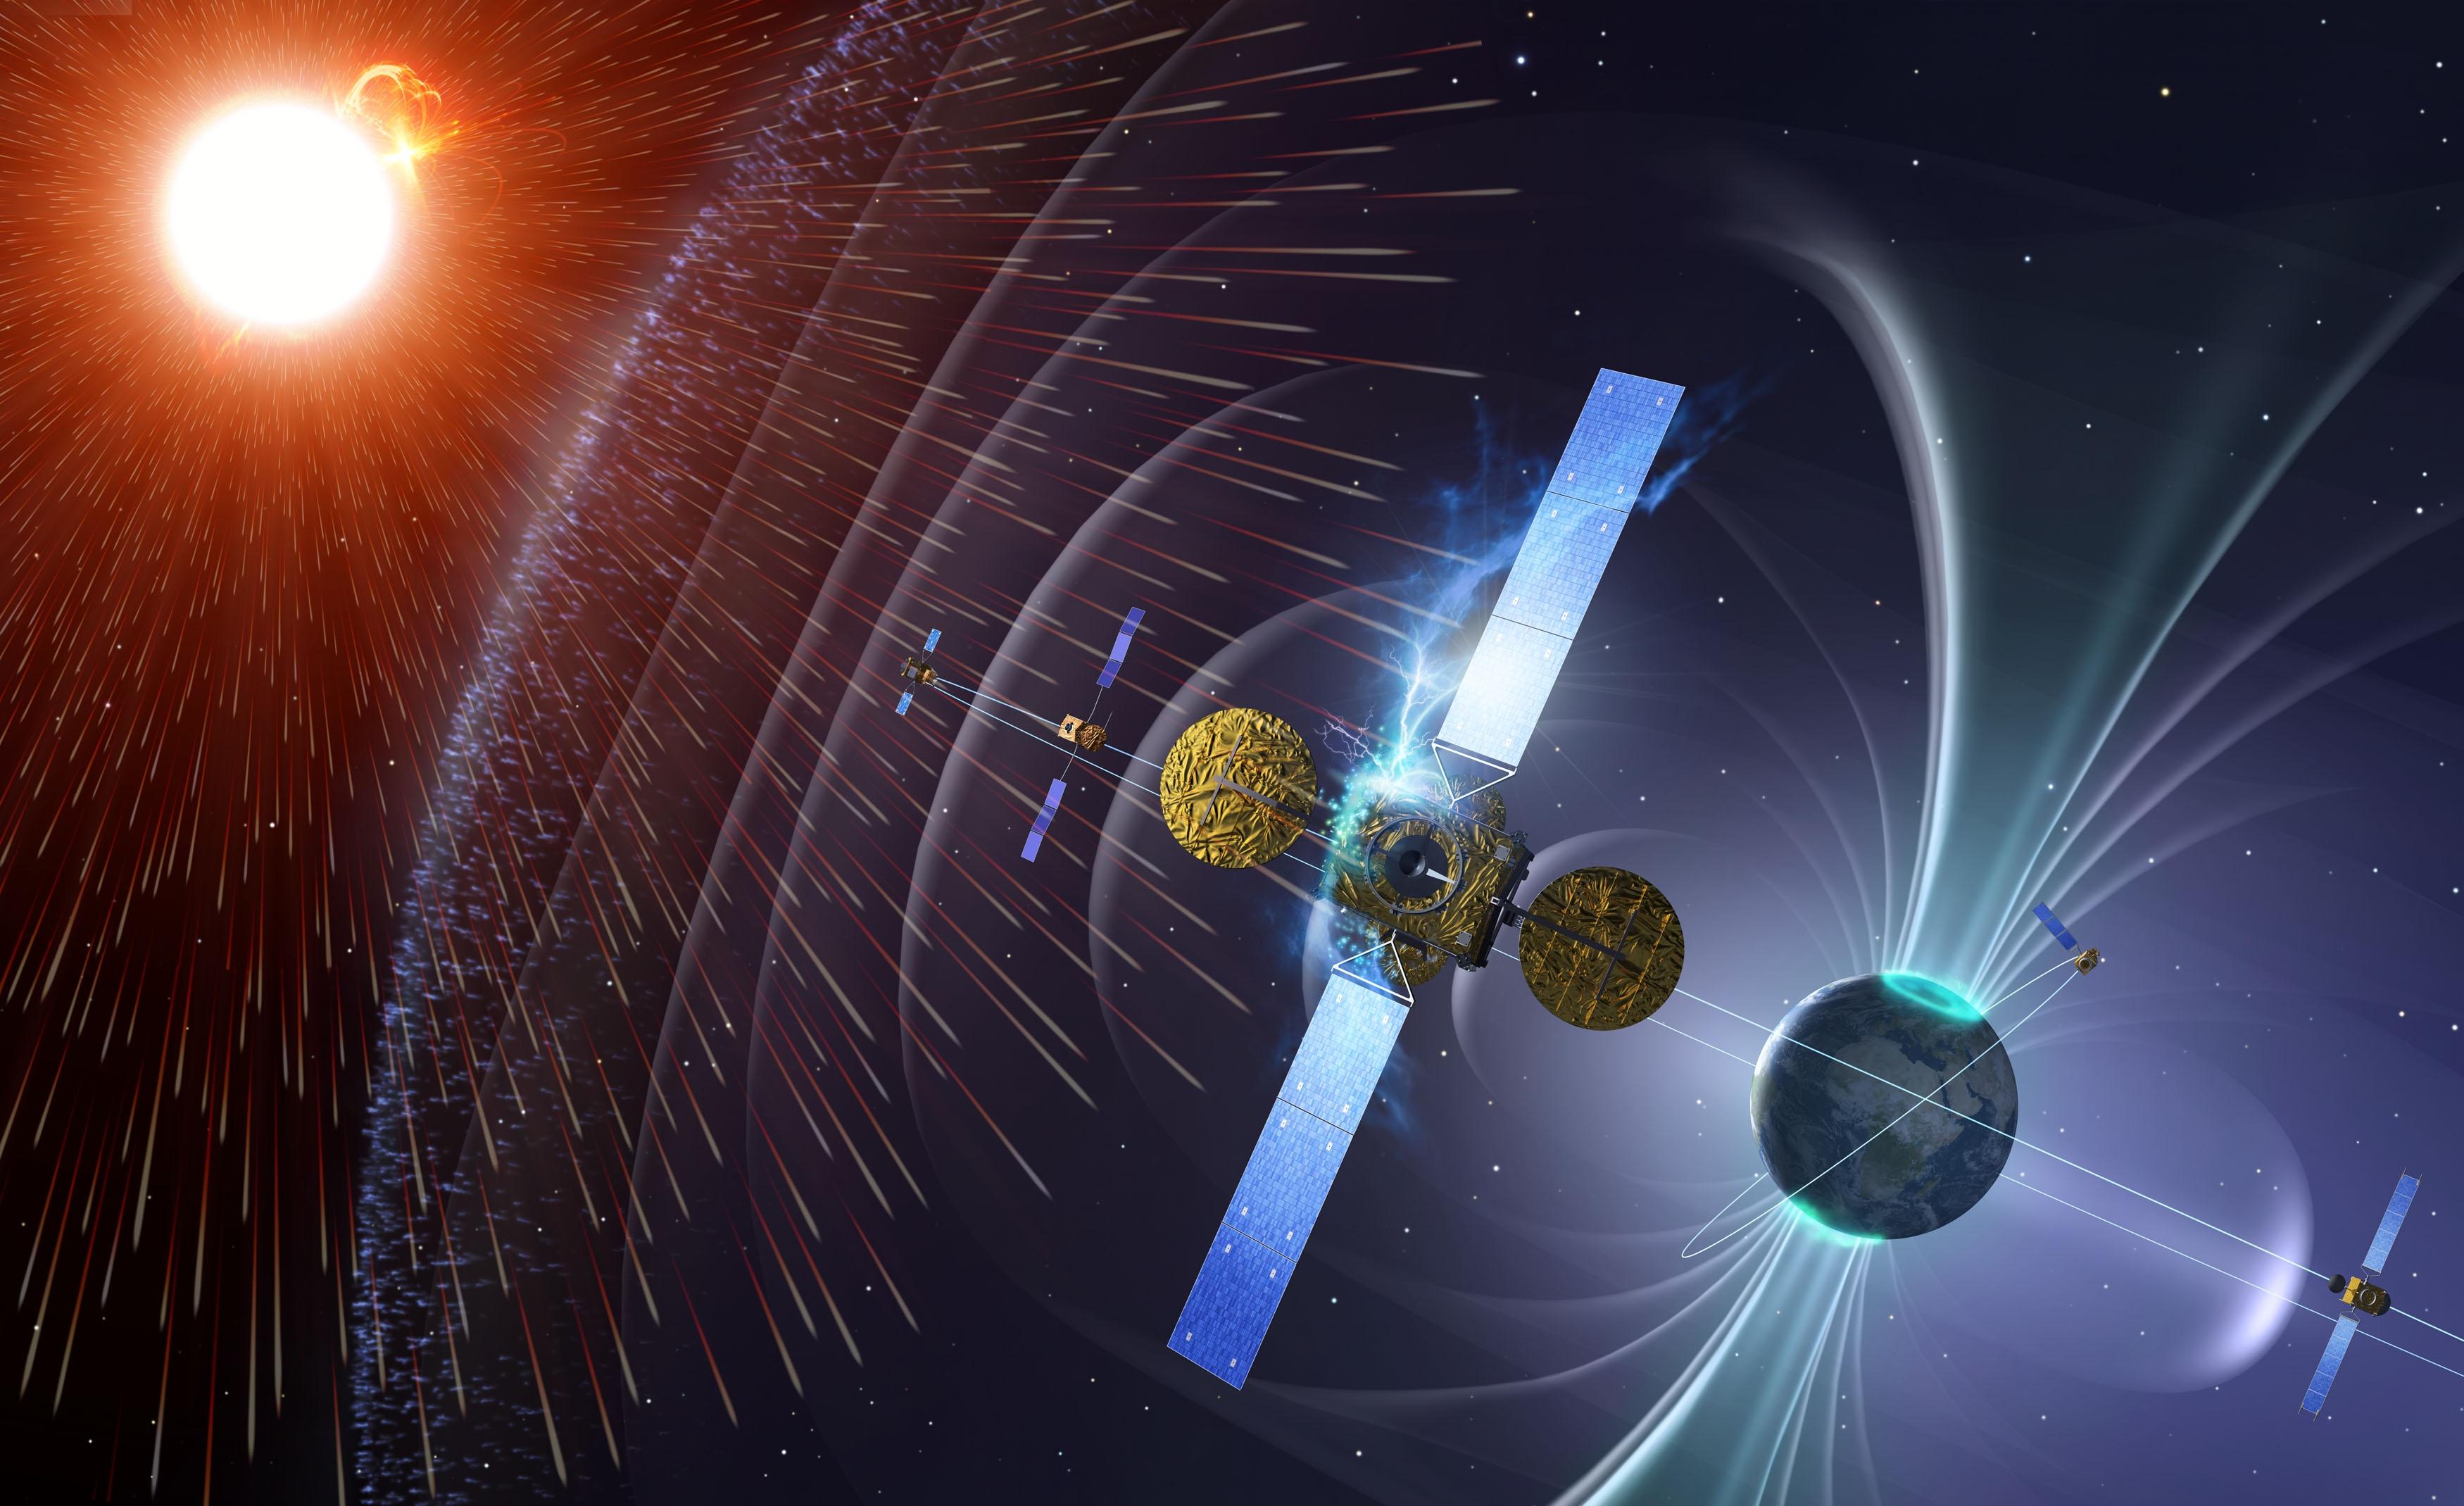 je_meteoespace_degatssatellites.jpg